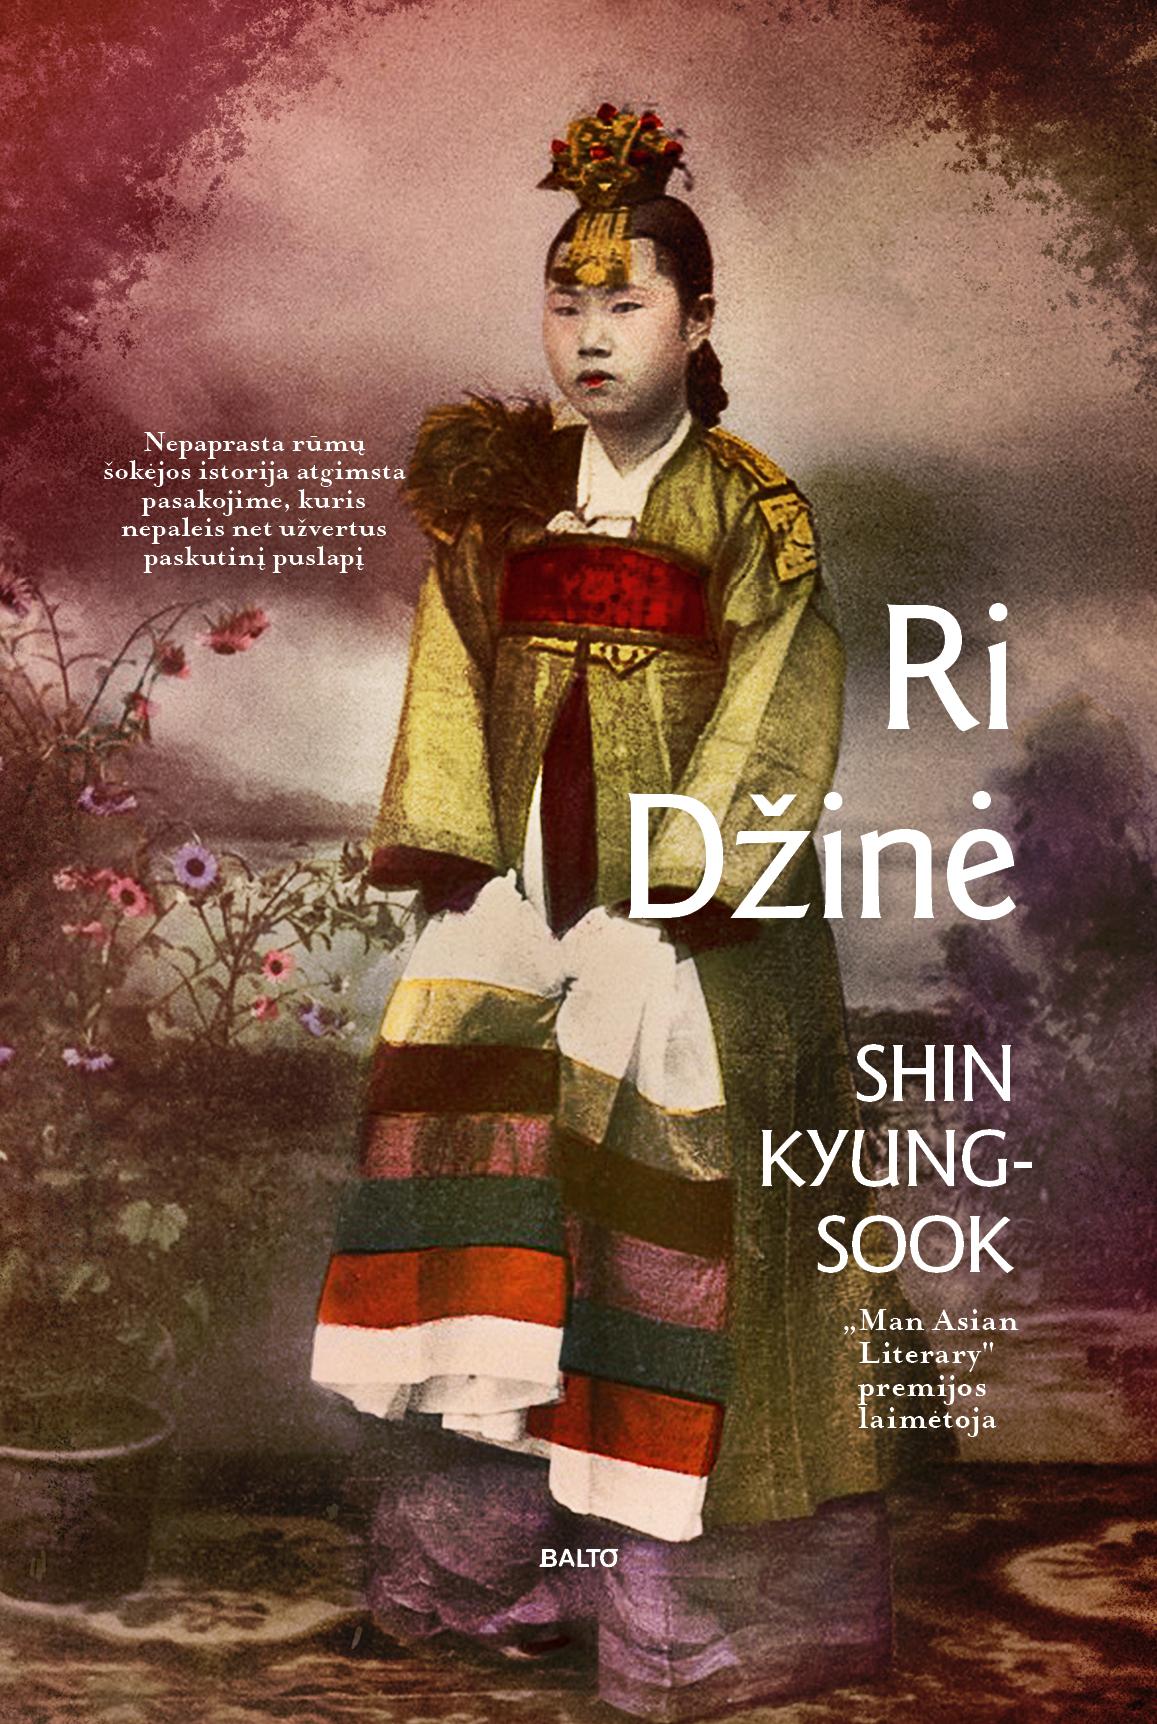 ri_dzine_cover approval.JPG